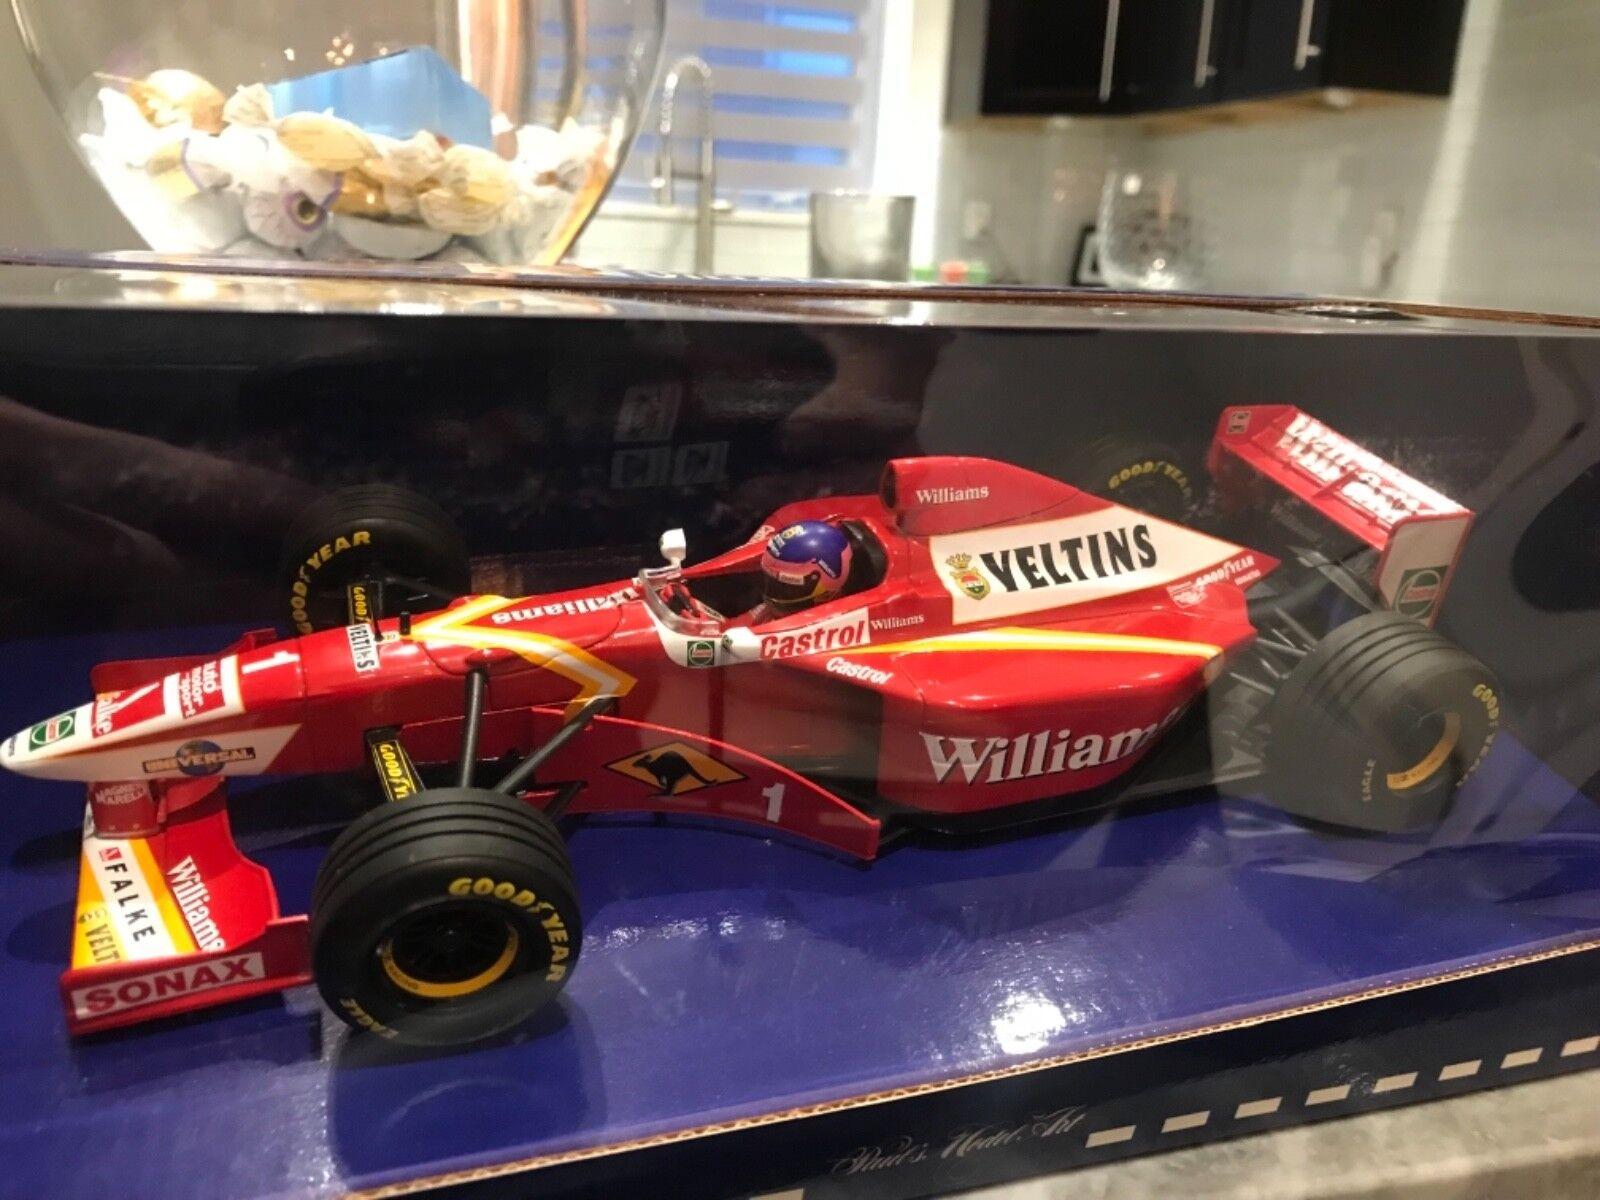 1/18 Minichamps Williams Mecachrome 2018 versión Jacques Villeneuve Nuevo Lanzamiento